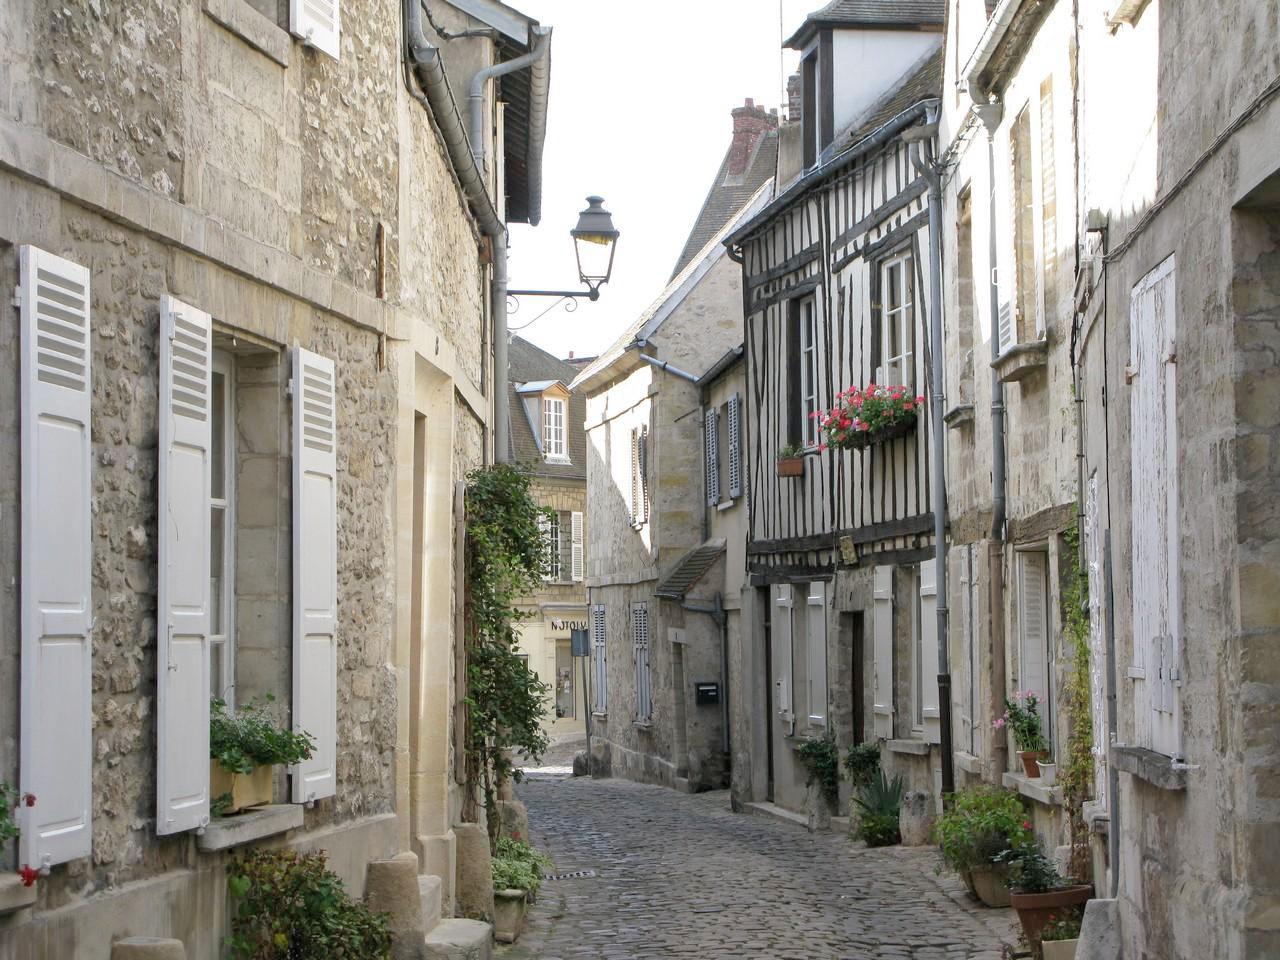 rue-de-la-tonnellerie-fnotsi